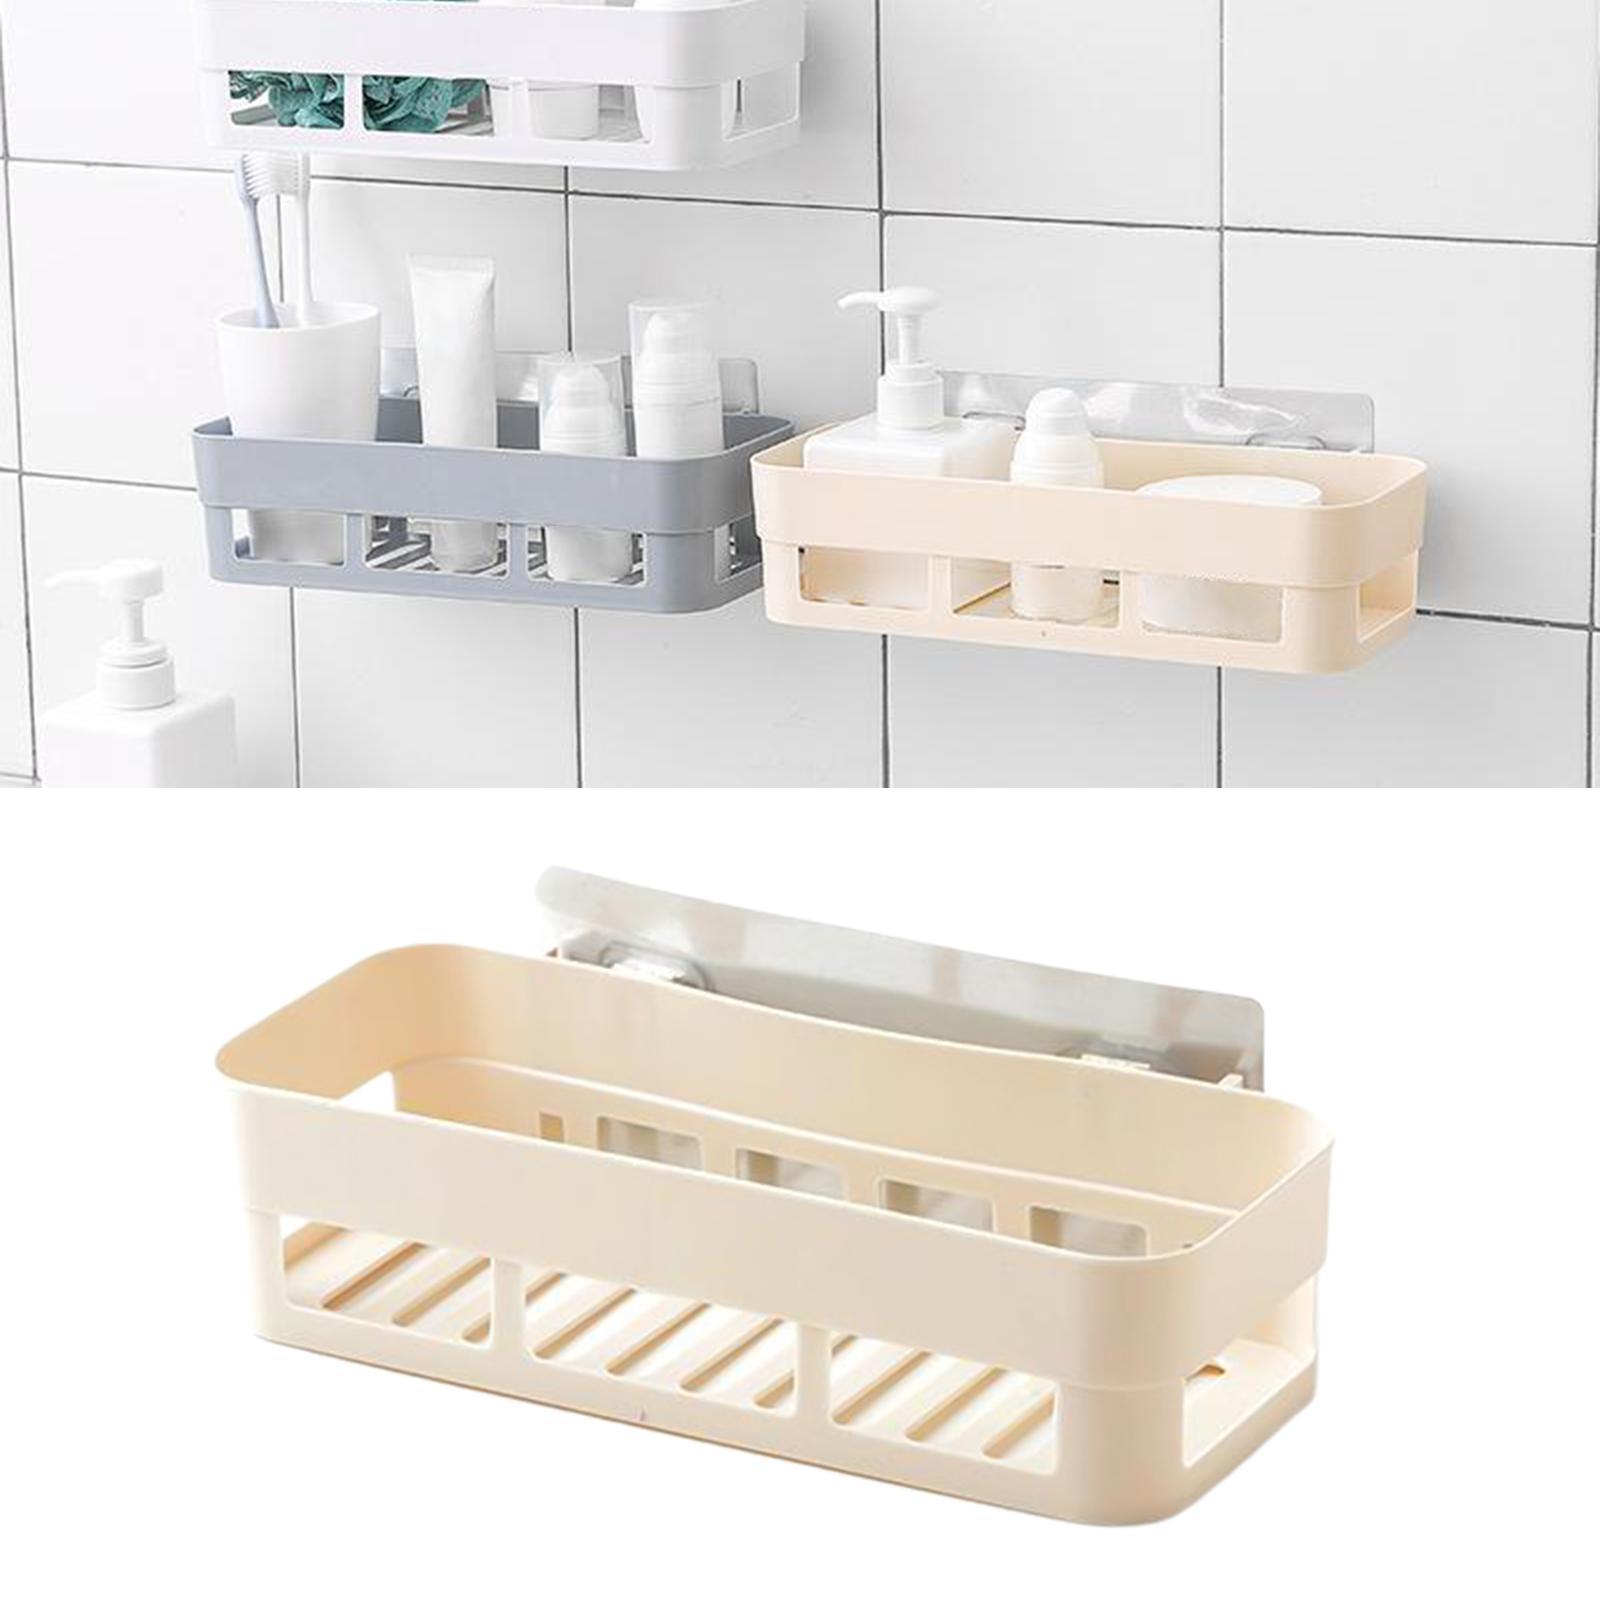 thumbnail 15 - Wall-Suction-Bathroom-Shelf-Shower-Caddy-Wall-Mount-Storage-Rack-Organizer